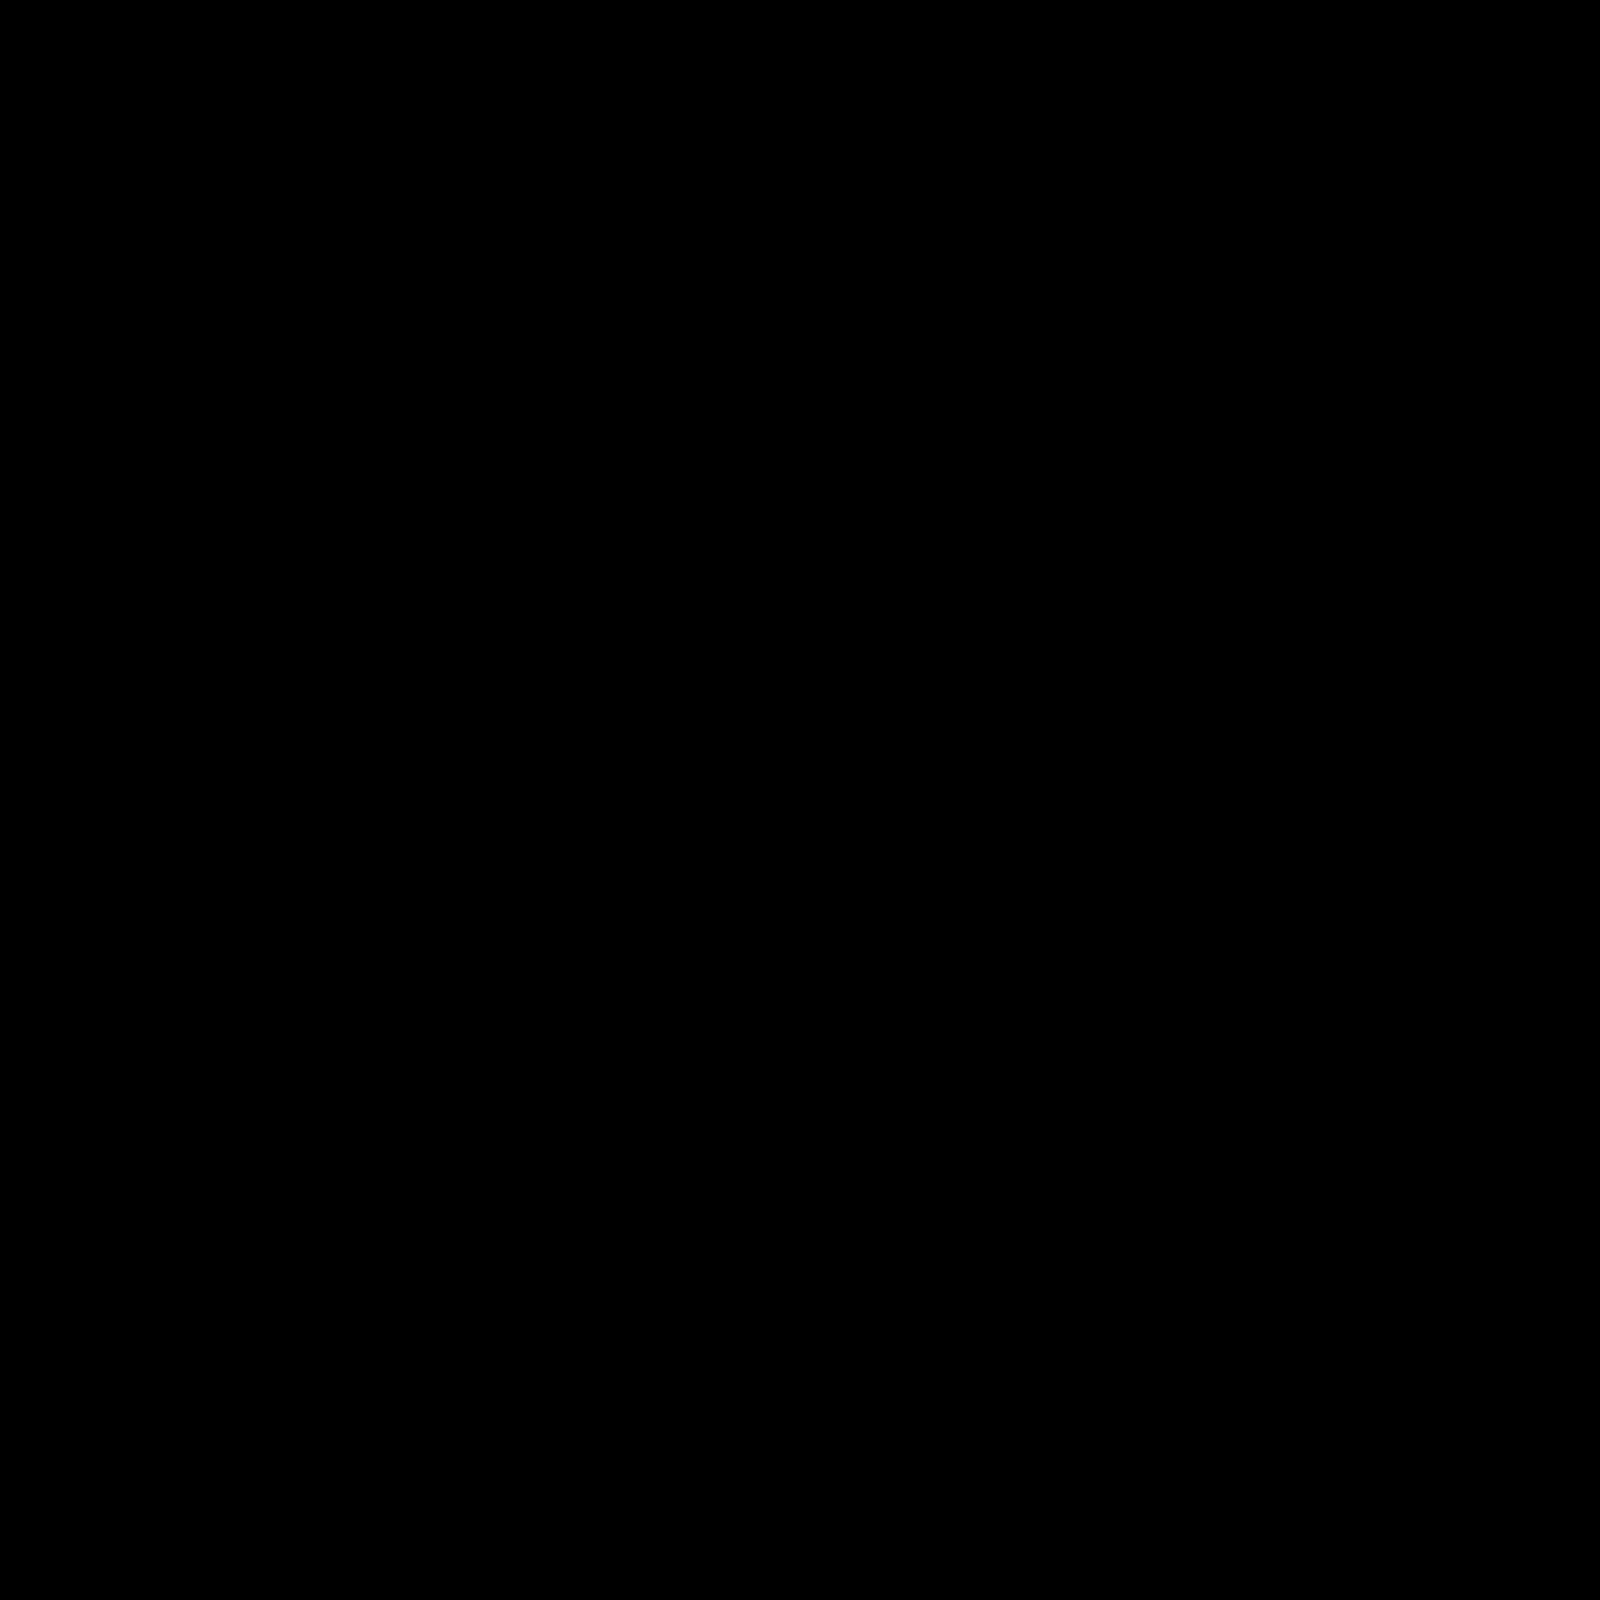 File:BlackDot.svg - Wikimedia Commons